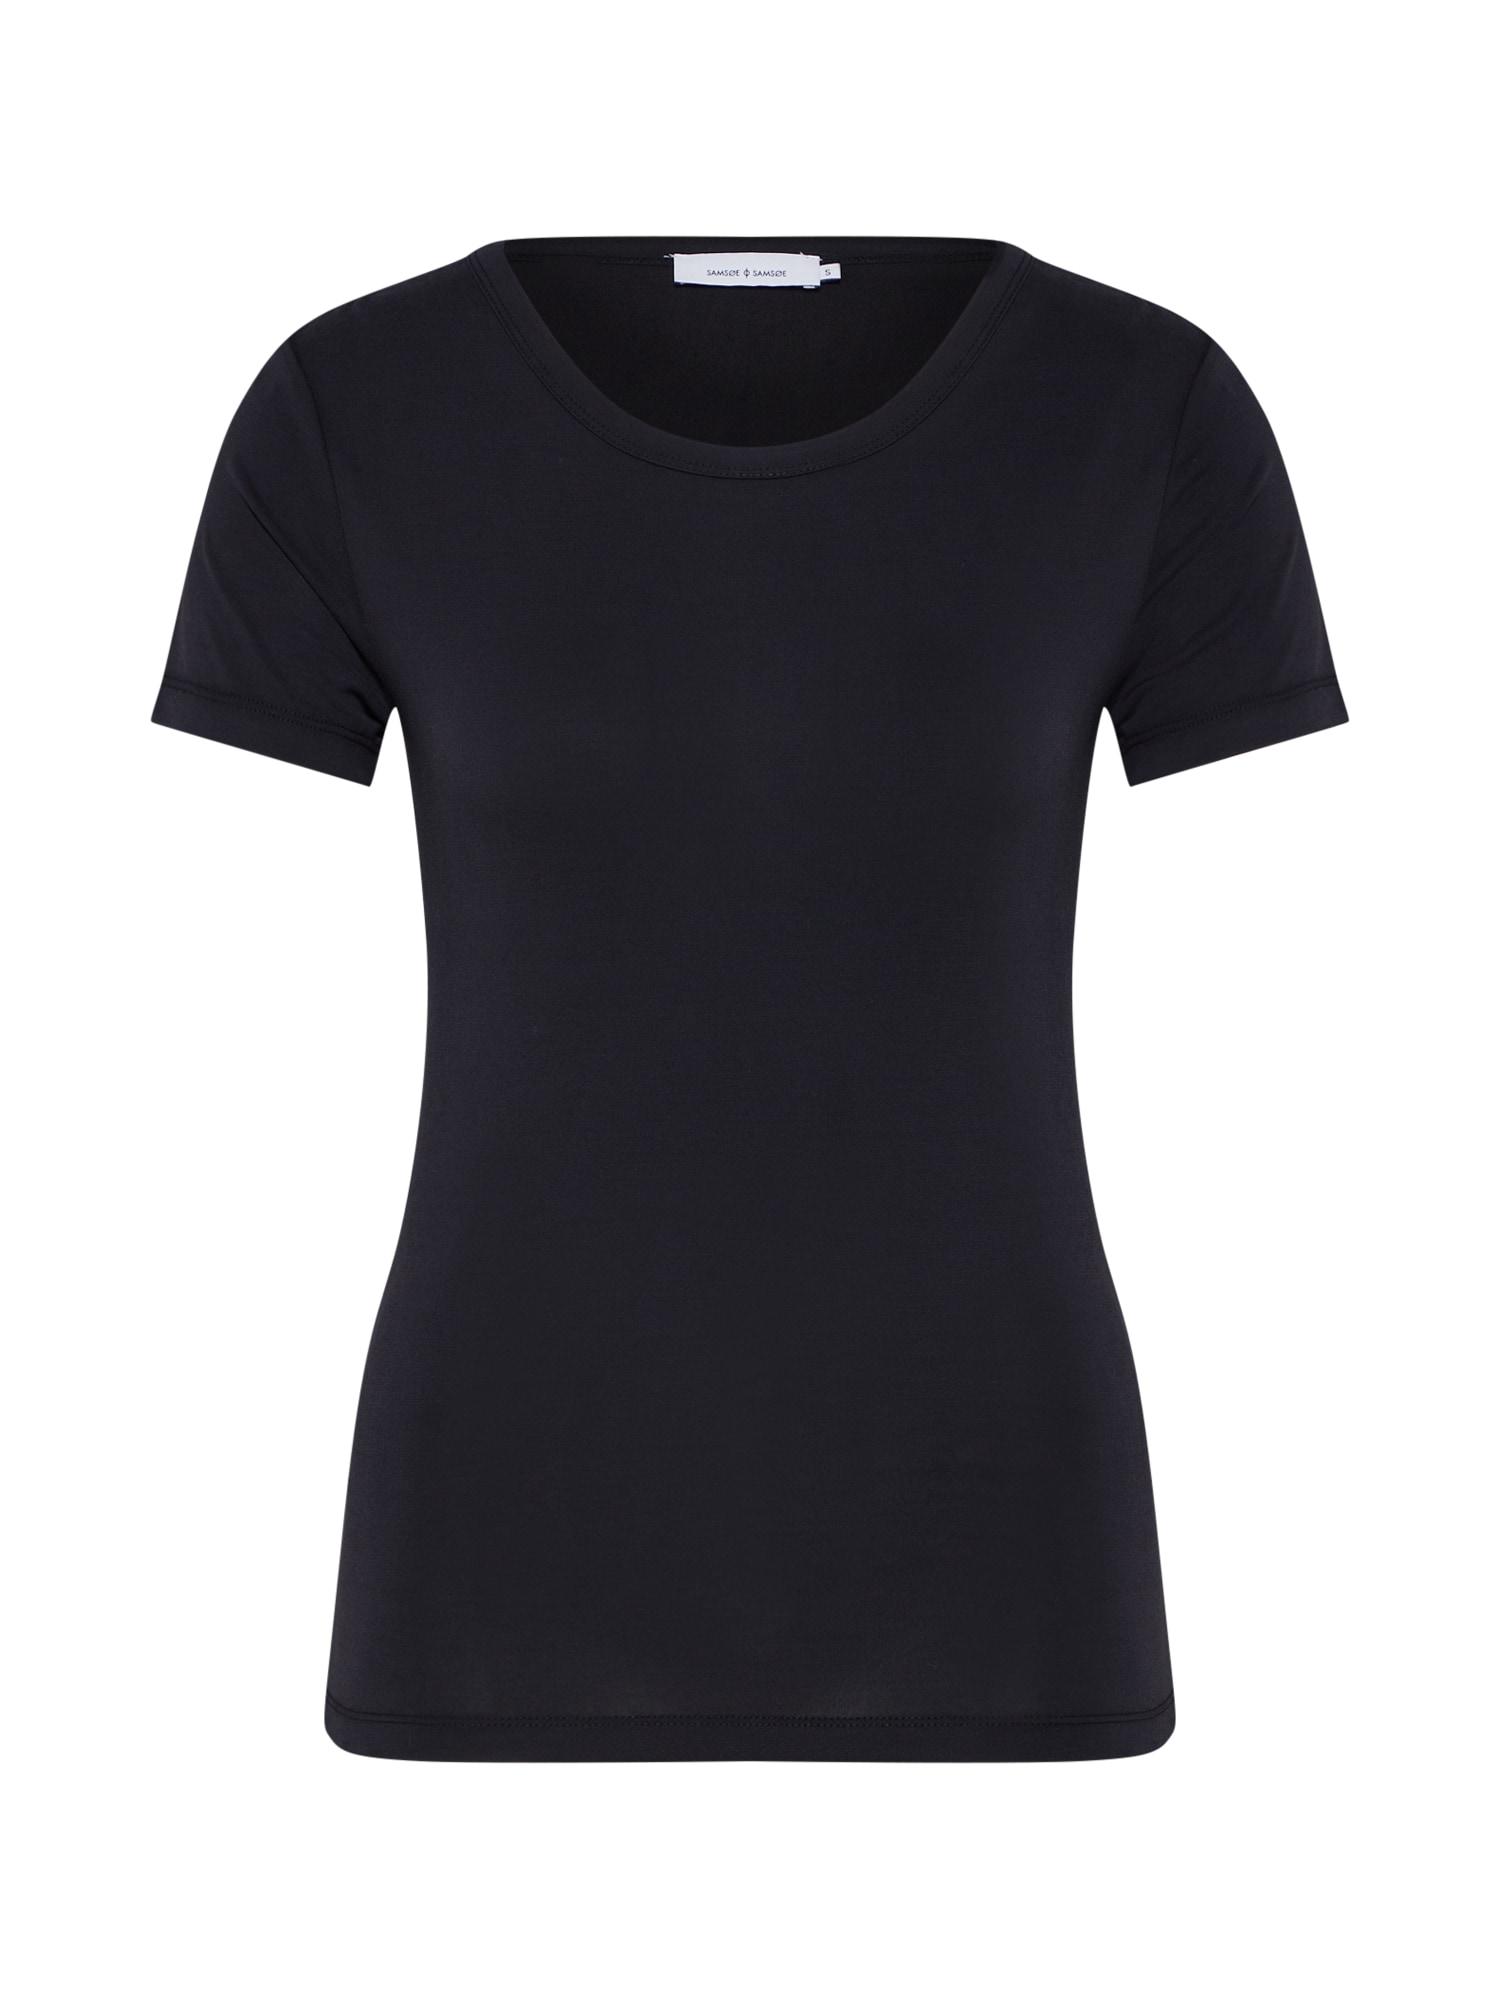 Tričko LILA SS 10348 černá Samsoe & Samsoe